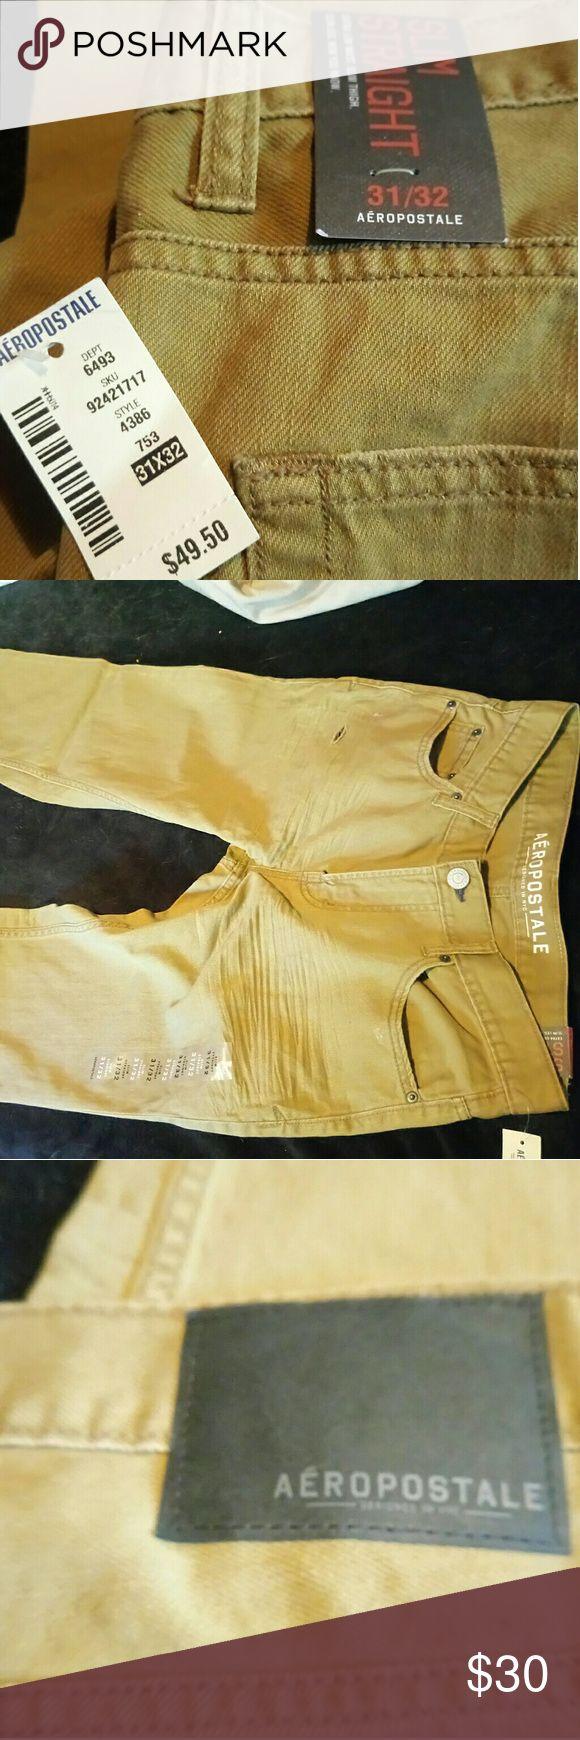 Mens kaki jeans New never worn mens kaki jeans Aeropostale  Jeans Slim Straight